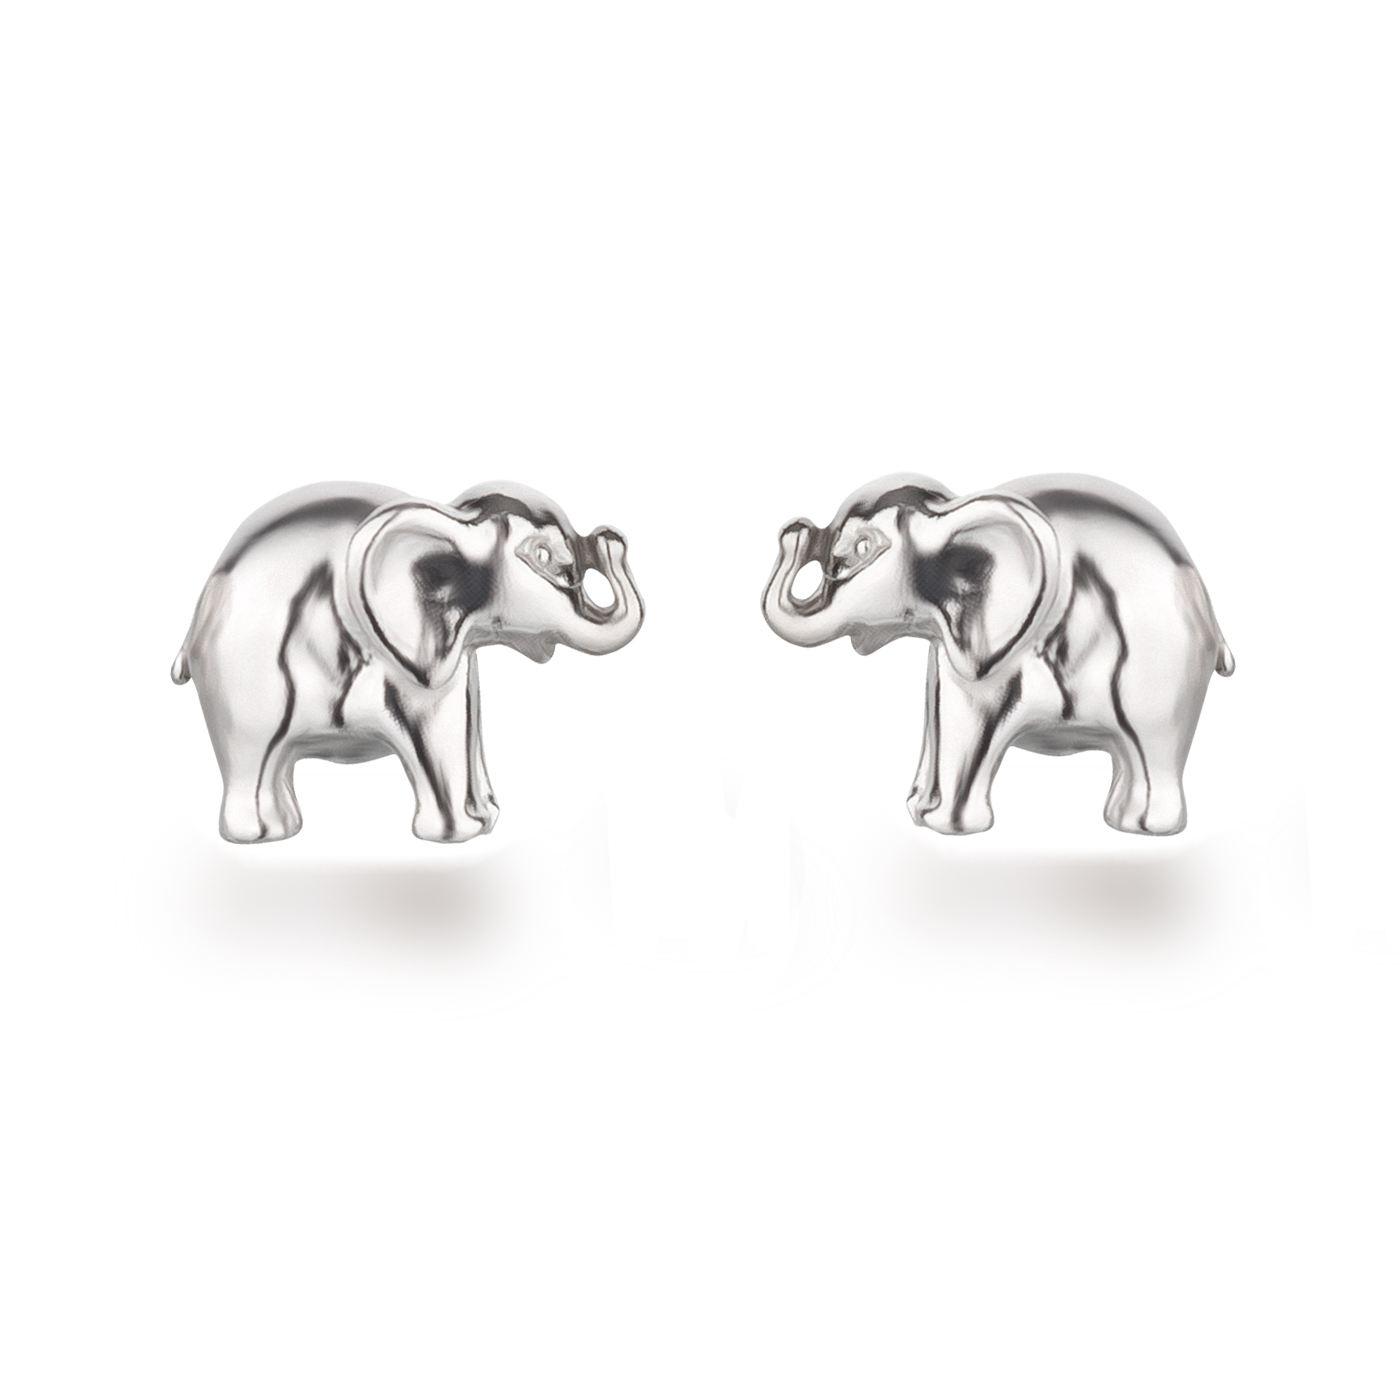 98785b34d38f Ohrstecker Elefant Motiv 925 Silber Rhodium Ohrringe für Kinder Mädchen    OS01-Elefant   EAN